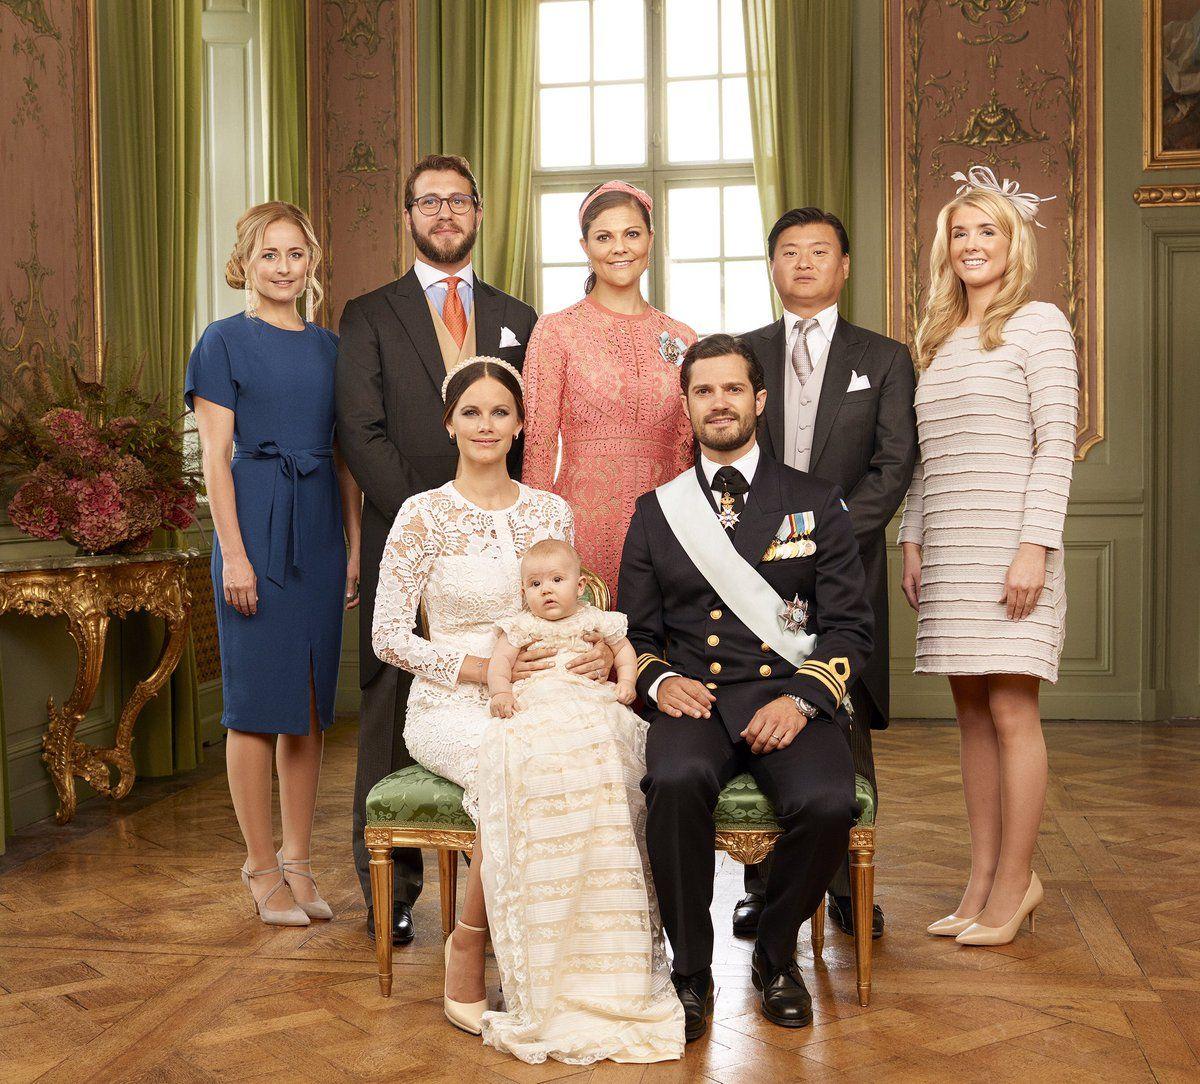 Scandinavian Royals Crownprincely Twitter Princess Victoria Of Sweden Princess Sofia Of Sweden Princess Sofia